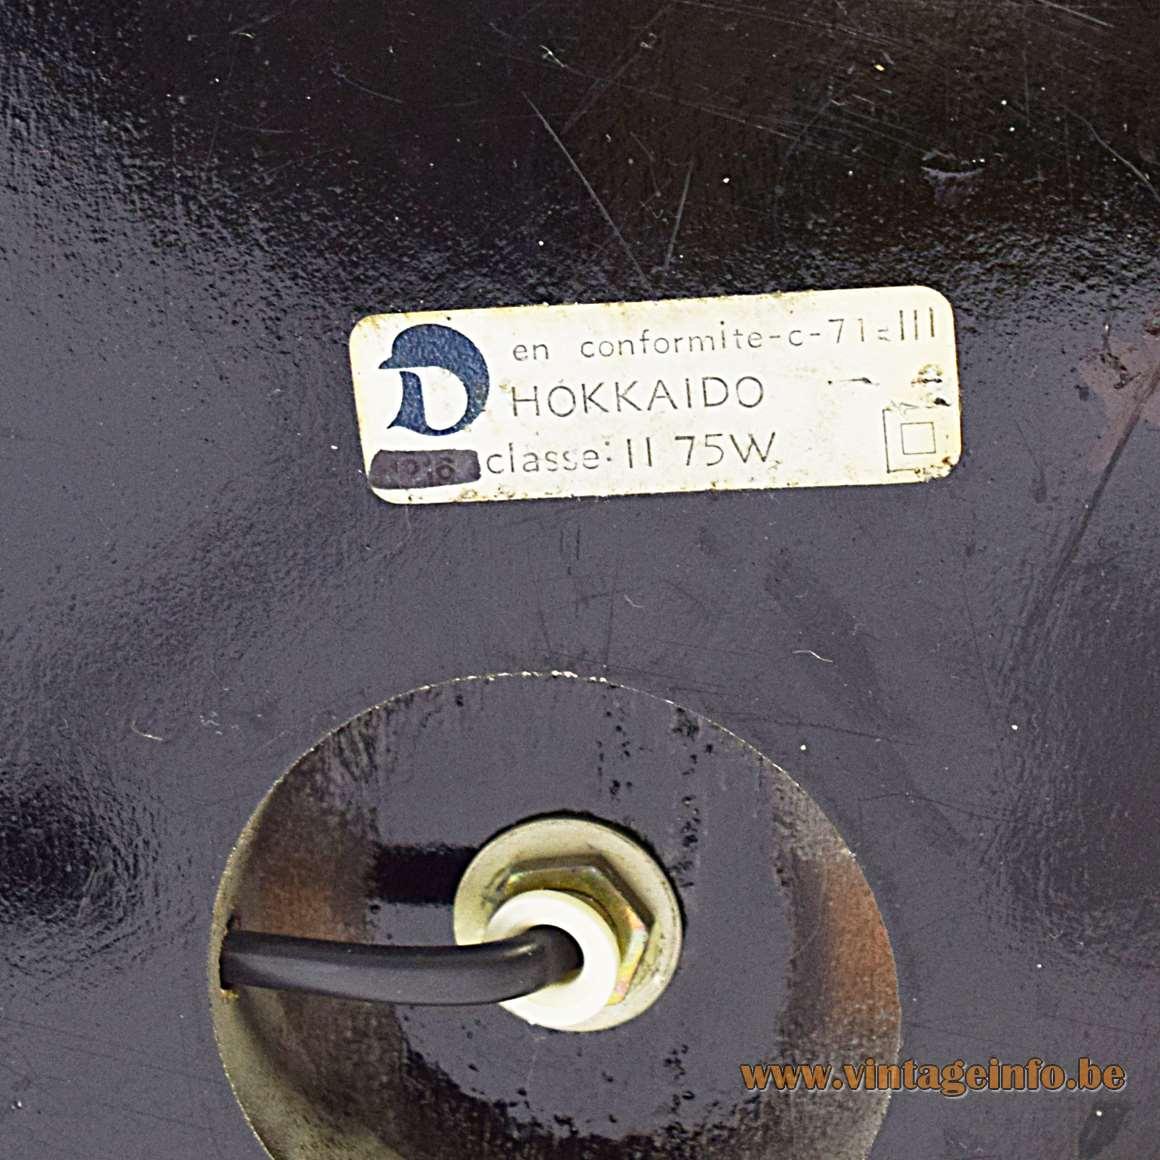 Hokkaido Table Lamp - label